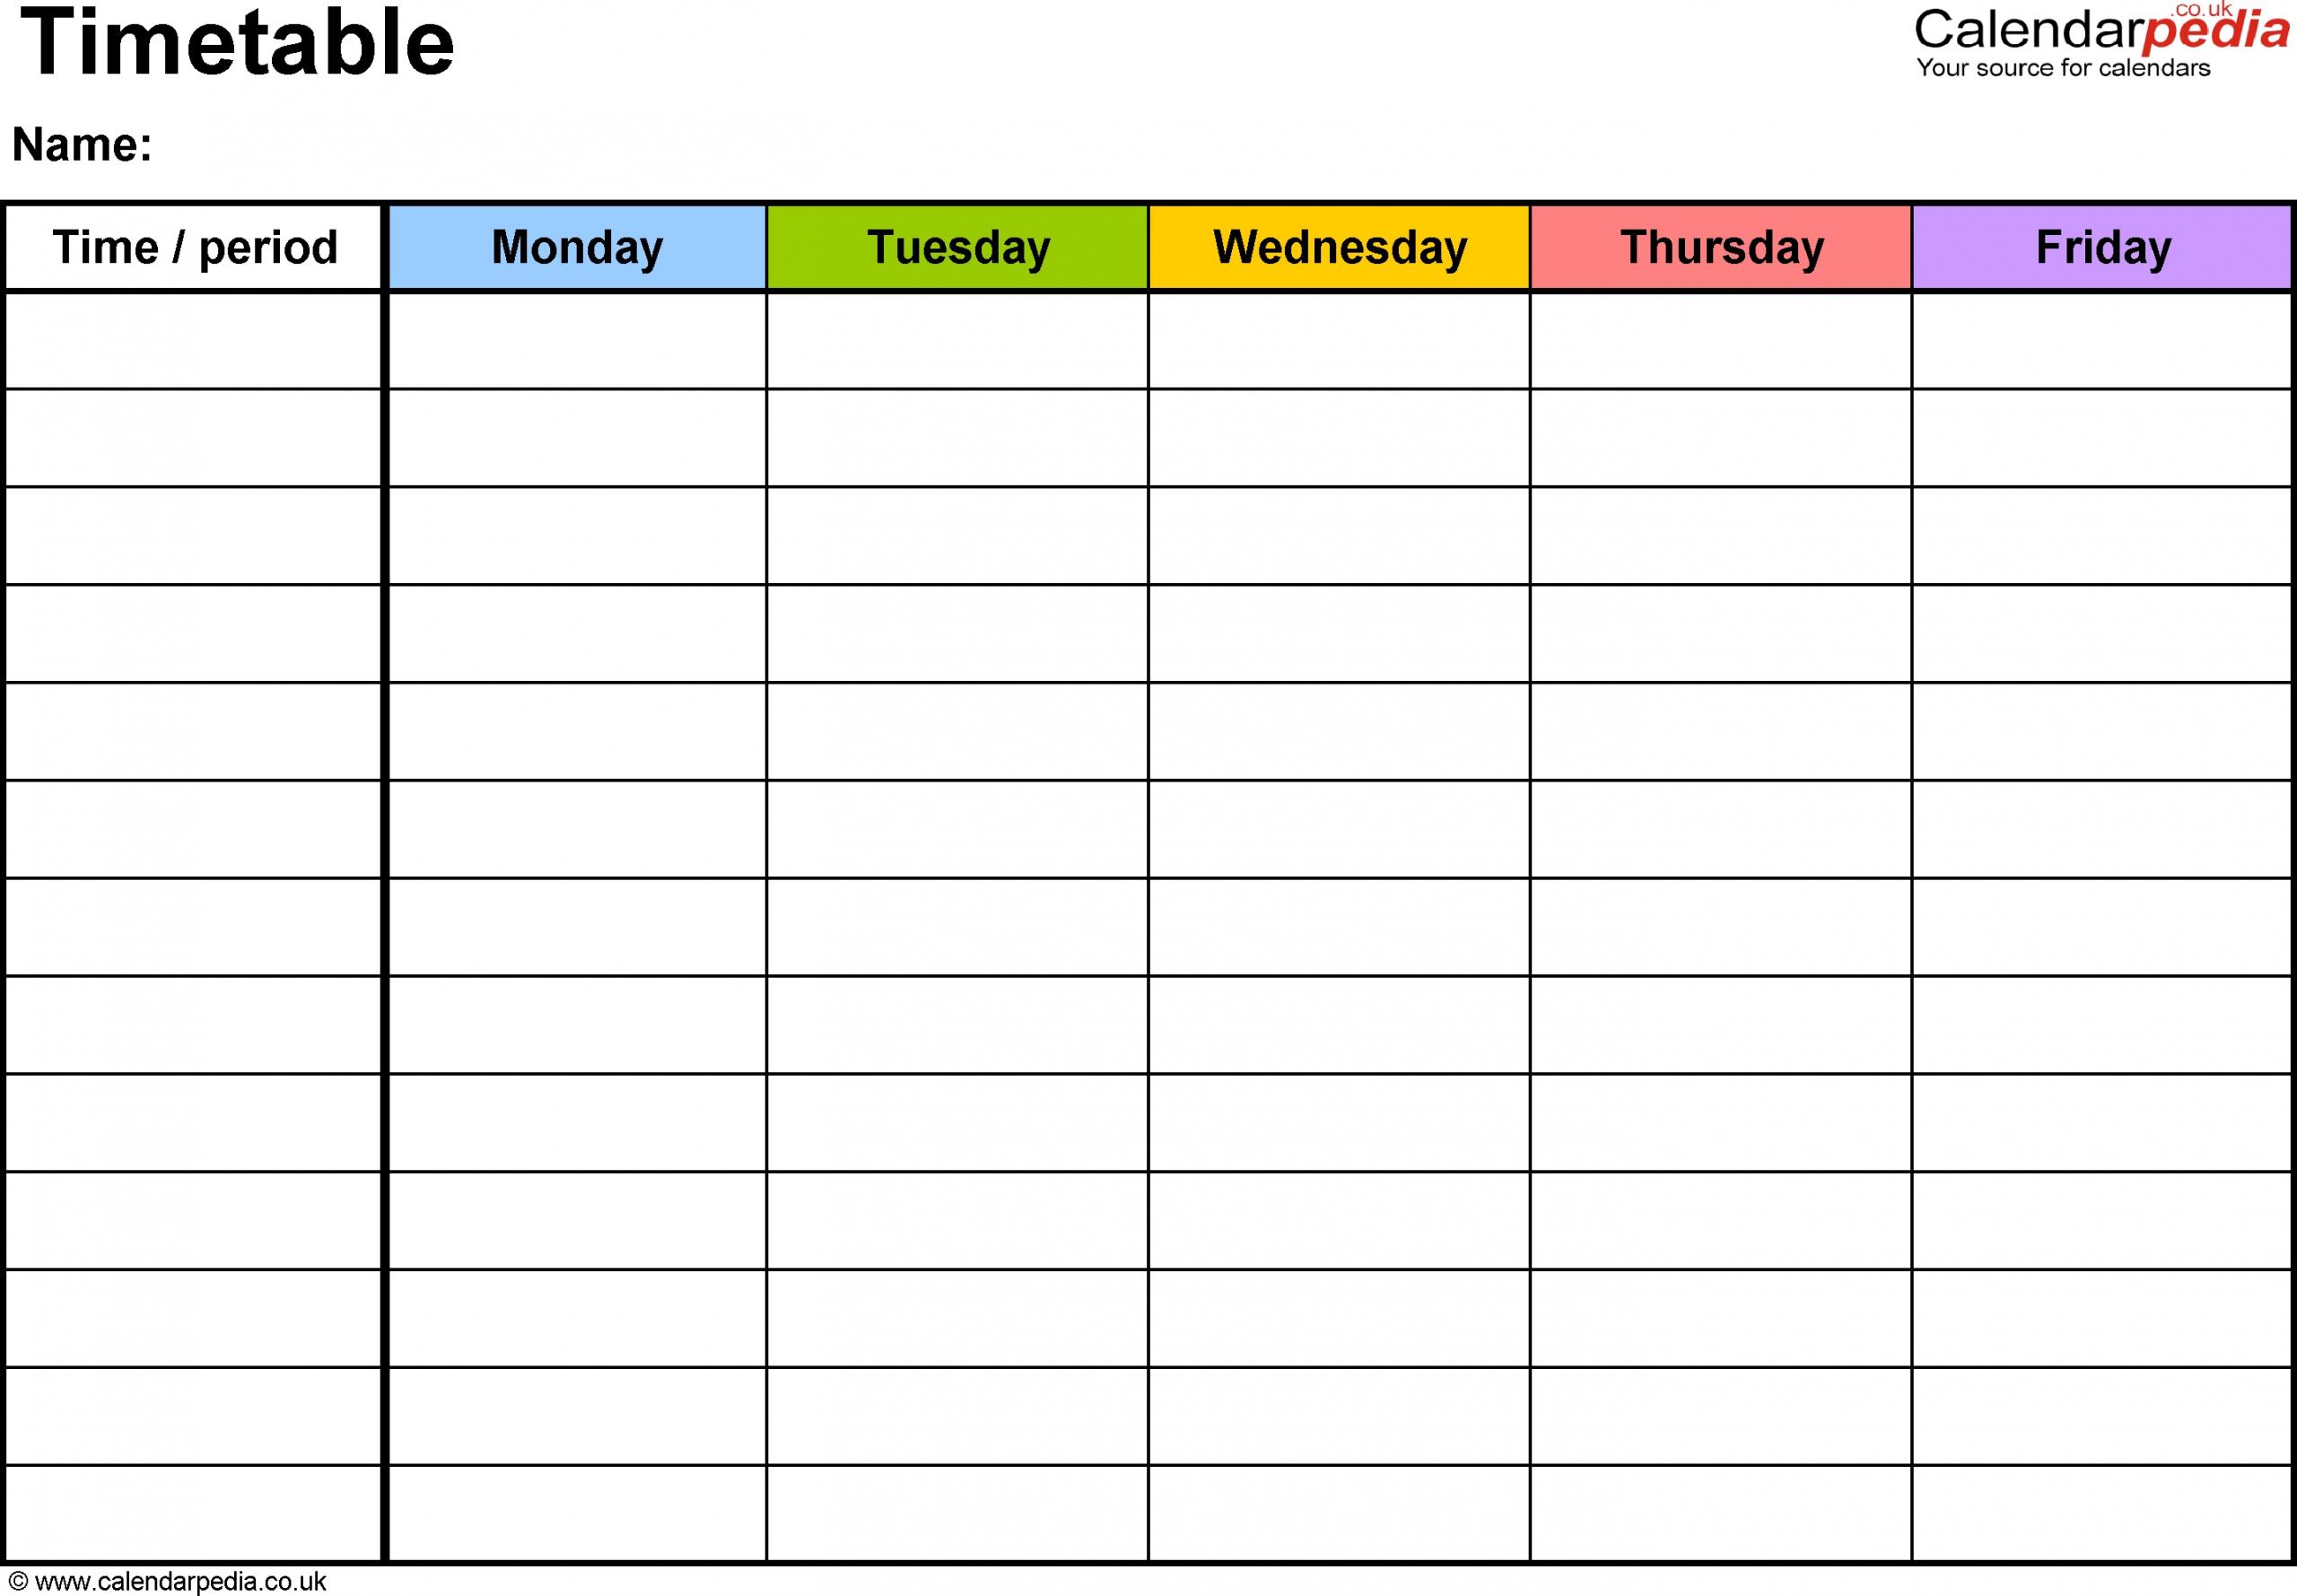 Get 5 Day Calendar For Microsoft Word